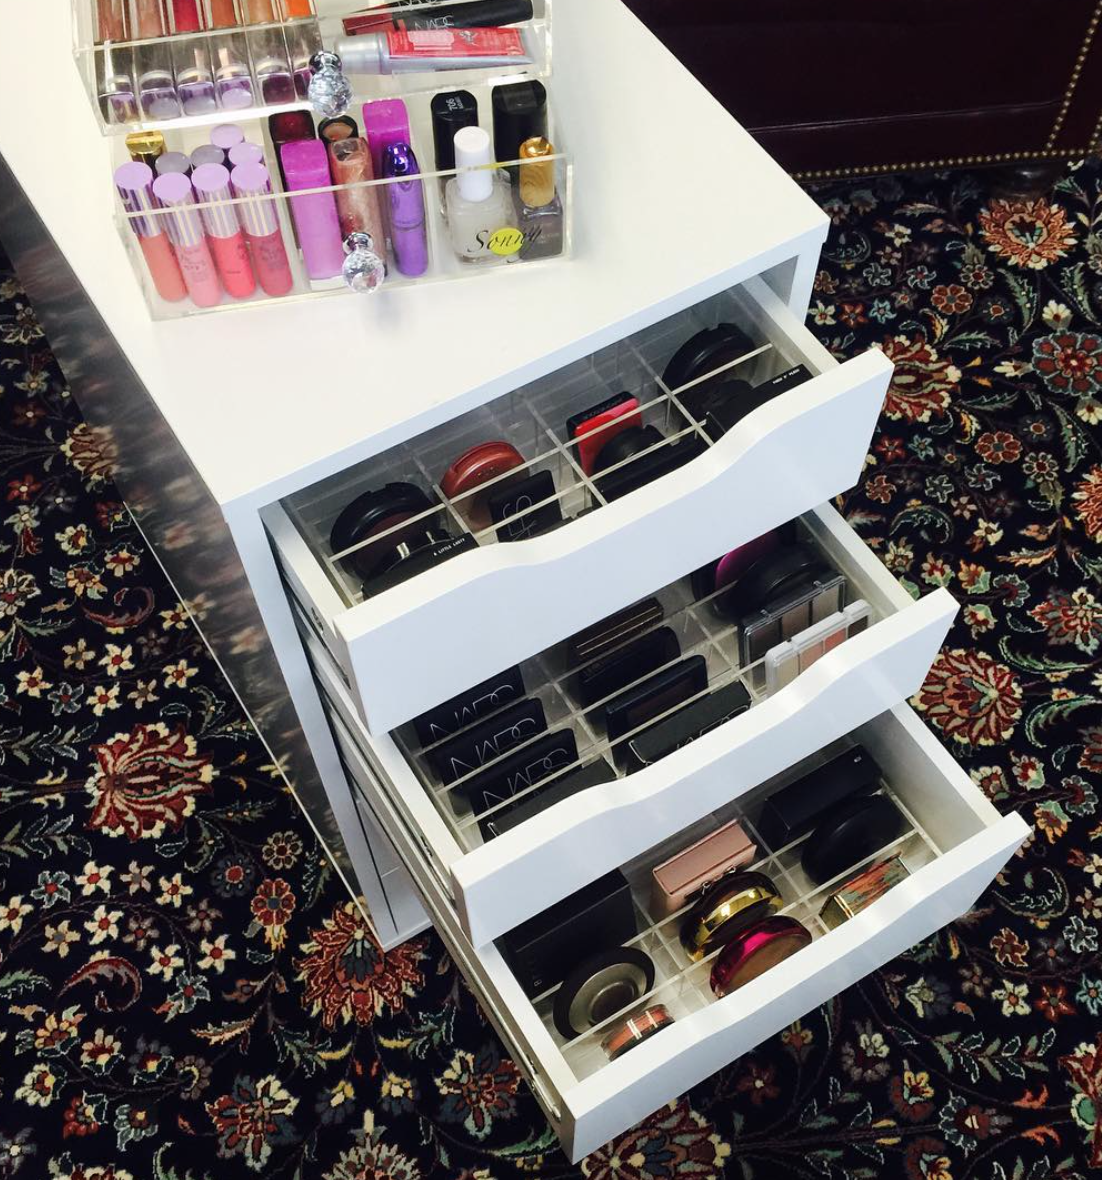 Sonny Cosmetics Ikea alex makeup organization and storage